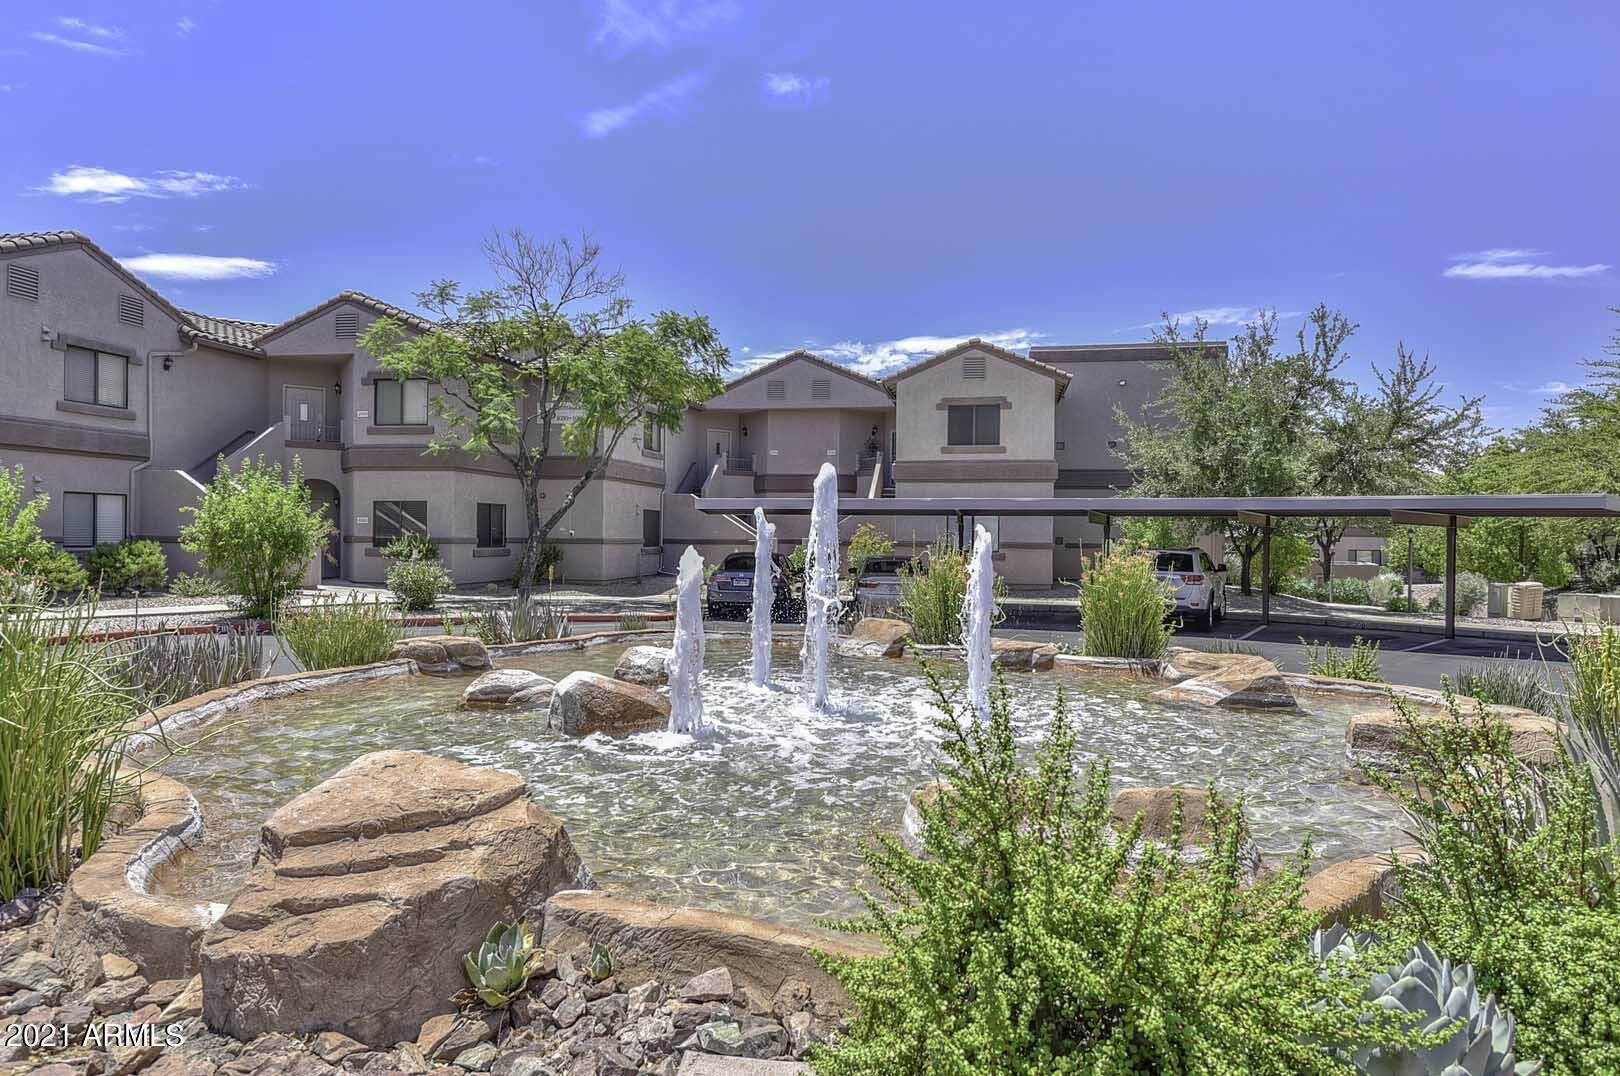 9555 E RAINTREE Drive #1060, Scottsdale, AZ 85260 - MLS#: 6267793